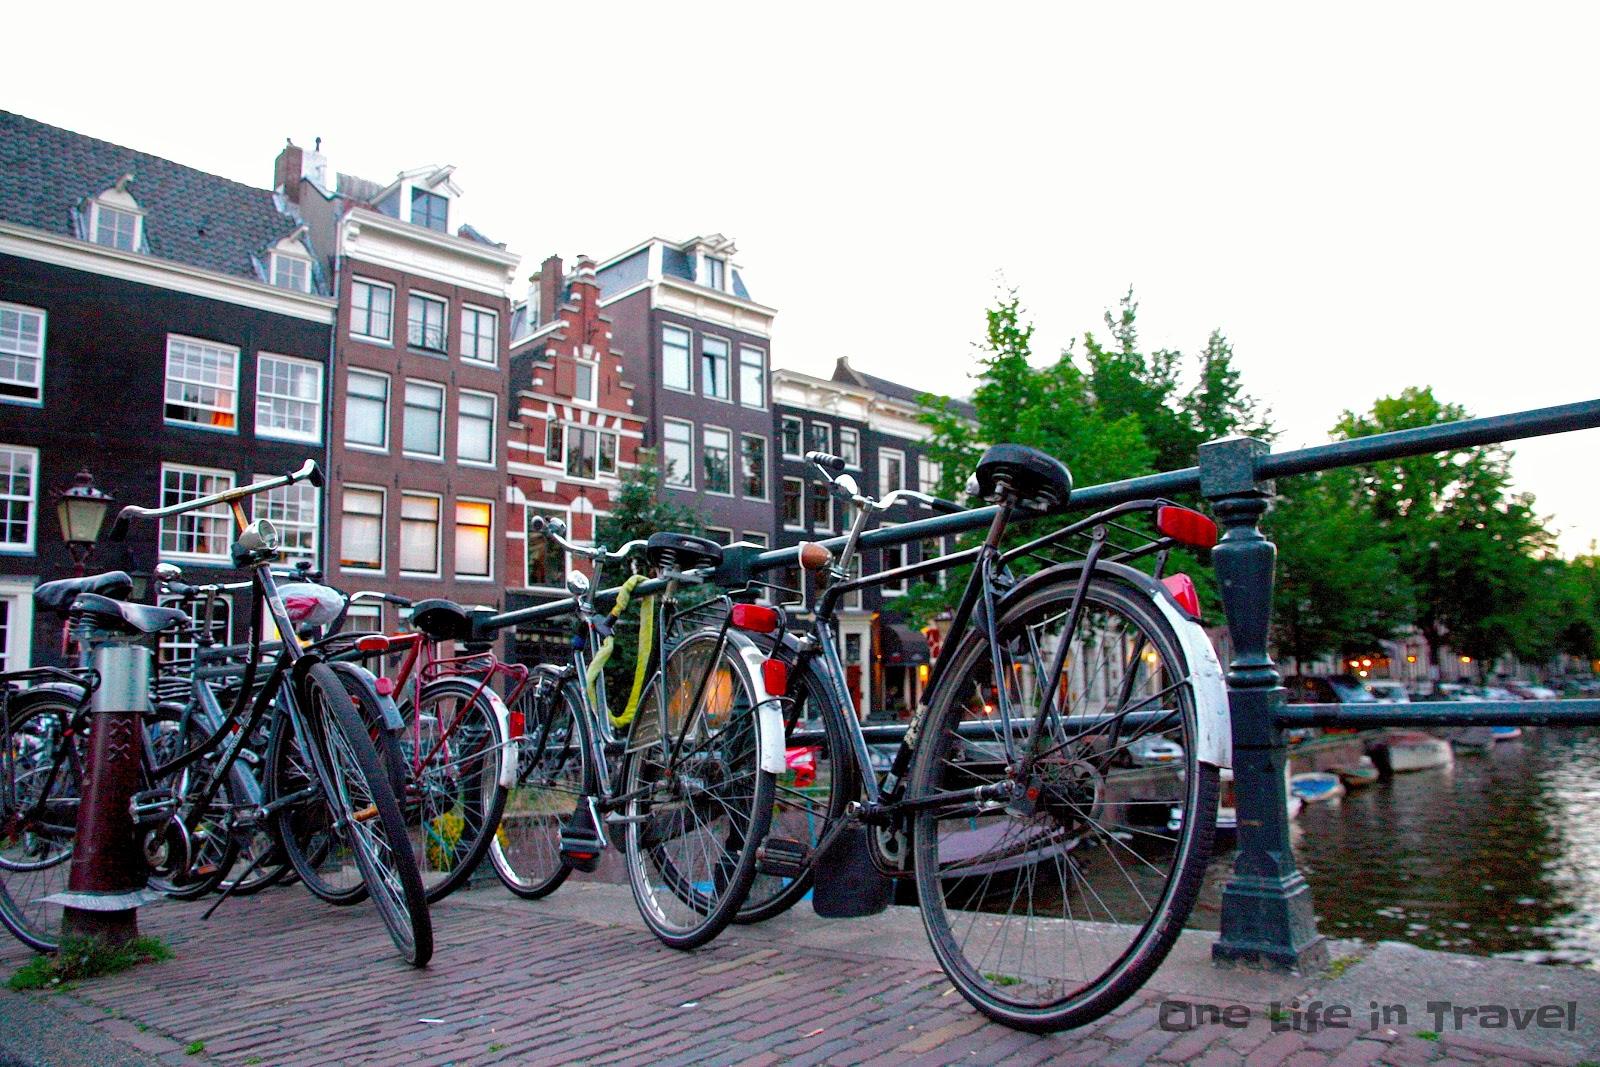 One life in travel amsterdam in bicicletta - Agenzie immobiliari amsterdam ...